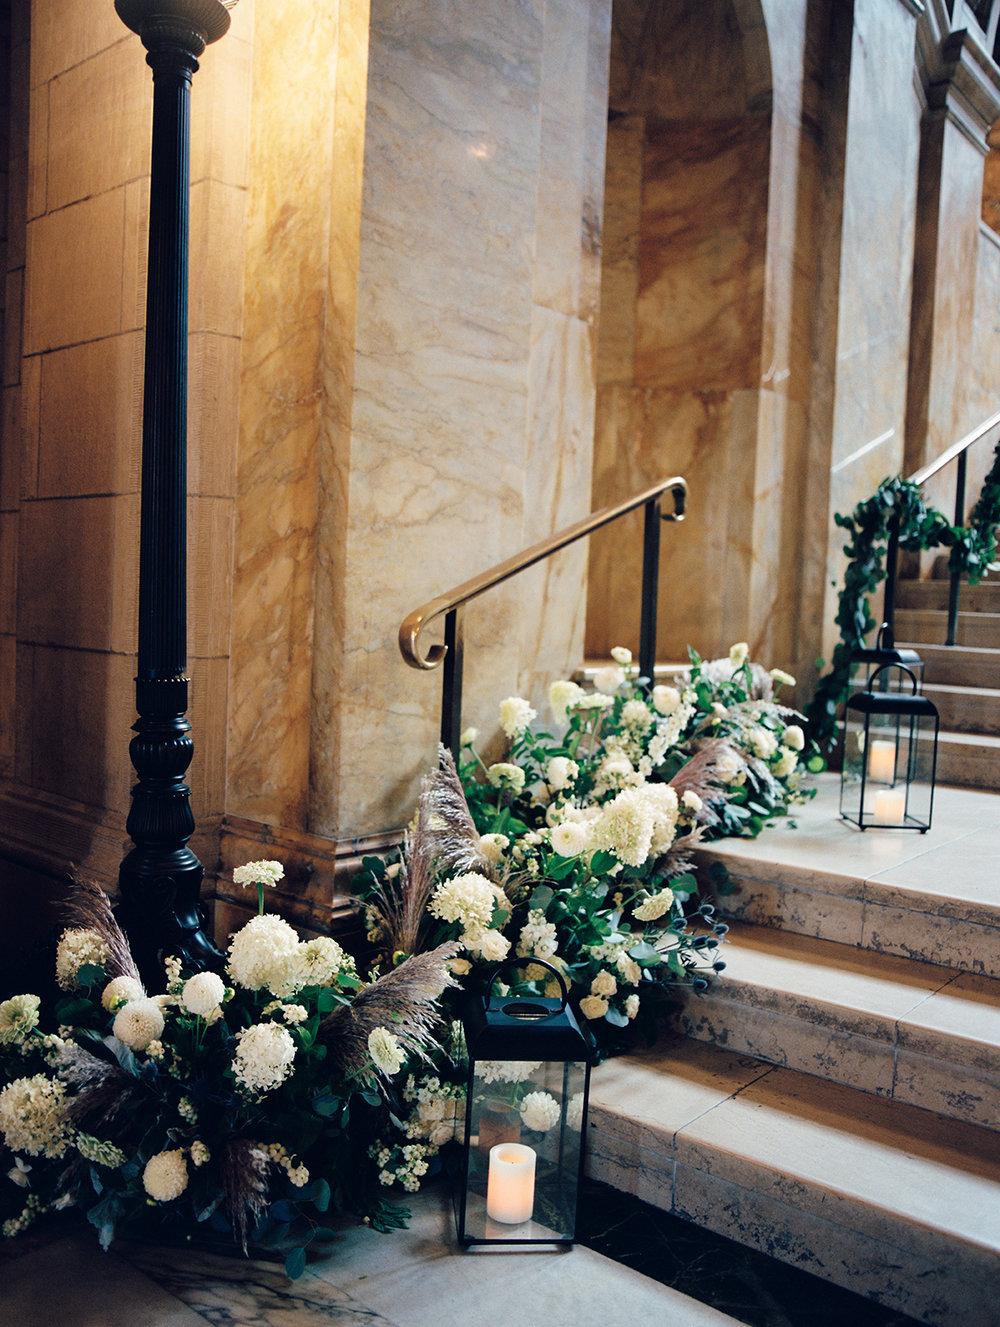 348-andrew-megan-boston-public-library-wedding-film-photographer.jpg